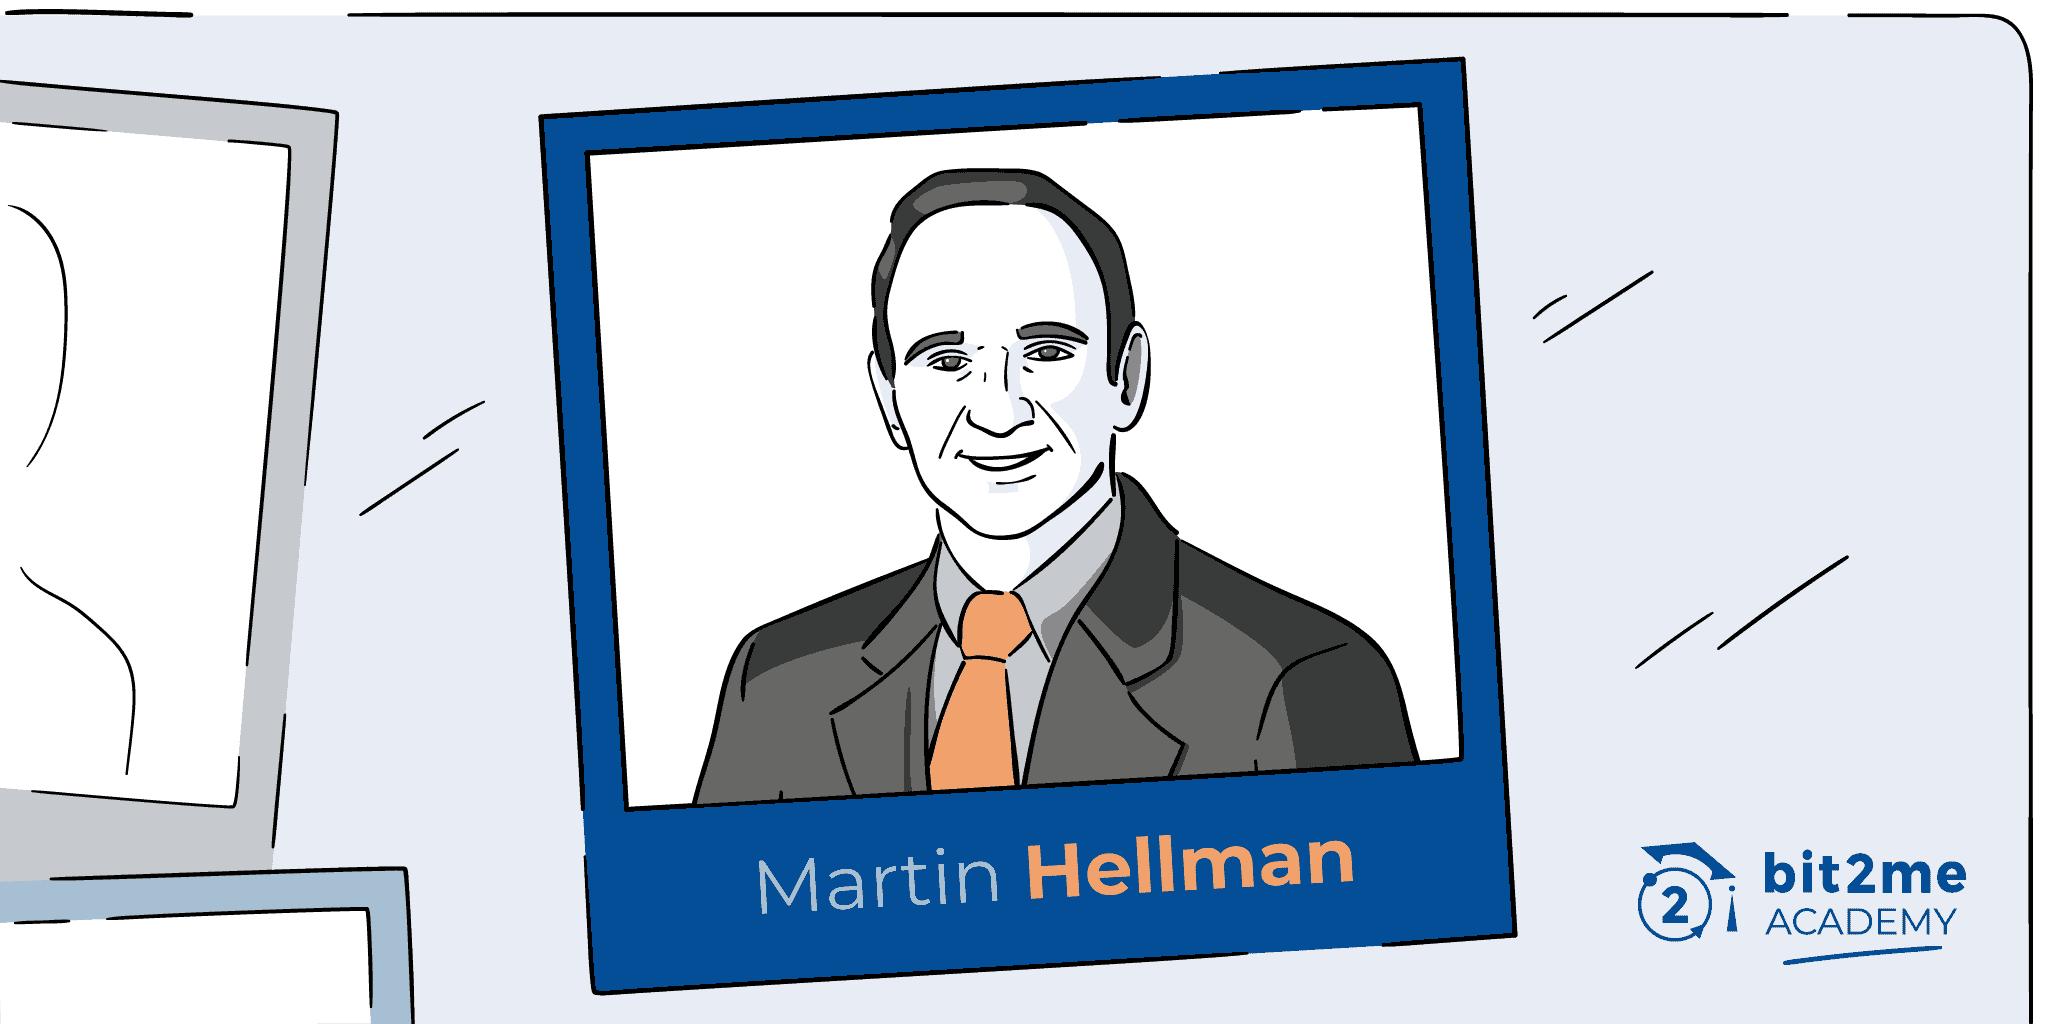 Criptografia de Martin Hellman